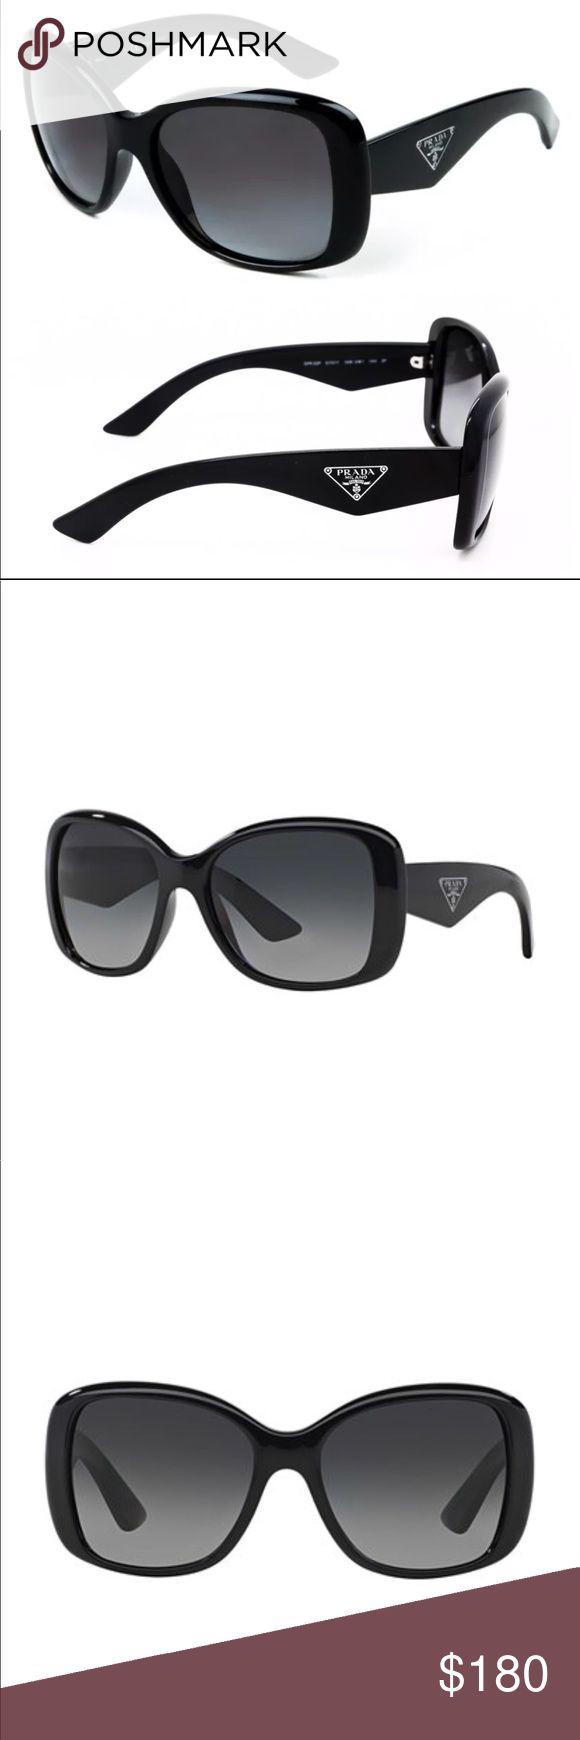 Prada 32PS Triangle Sunglasses 1AB5W1 Black - NWT Prada 32PS Triangle Sunglasses 1AB5W1 Black Details: NWT Model: Prada 0PR32PS Sunglasses Frame Color: Black Lens Color: Polar Grey Color Code: 1AB5W1 Size: 5717-140 Gender: Female Shape: Square Frame Material: Plastic Prada Accessories Glasses